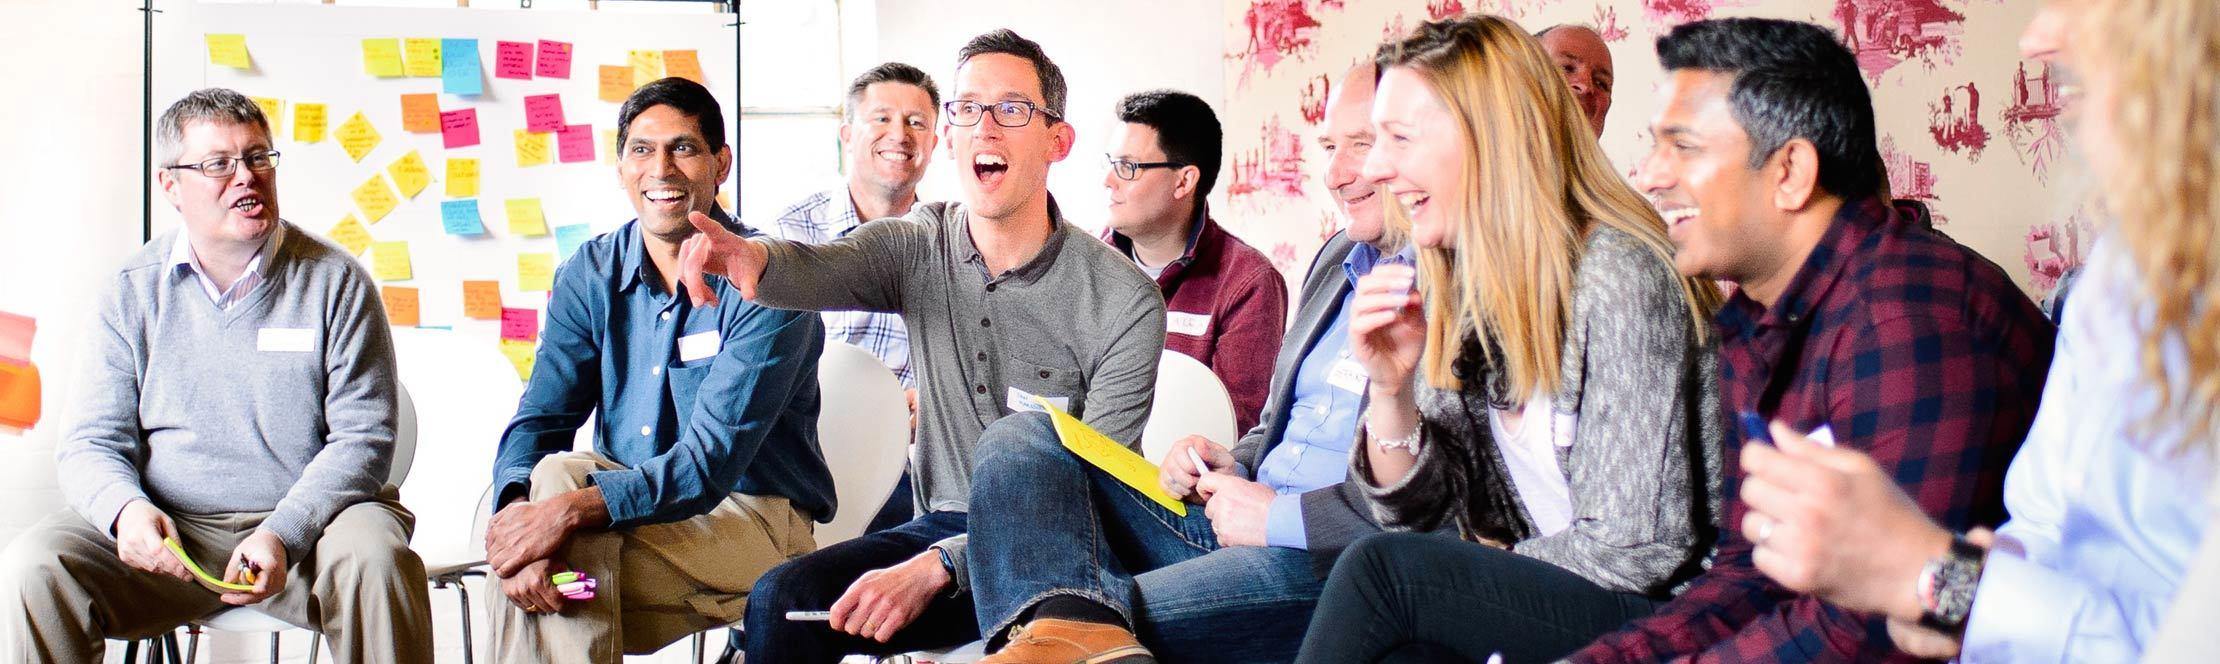 Involve Event Management Culture